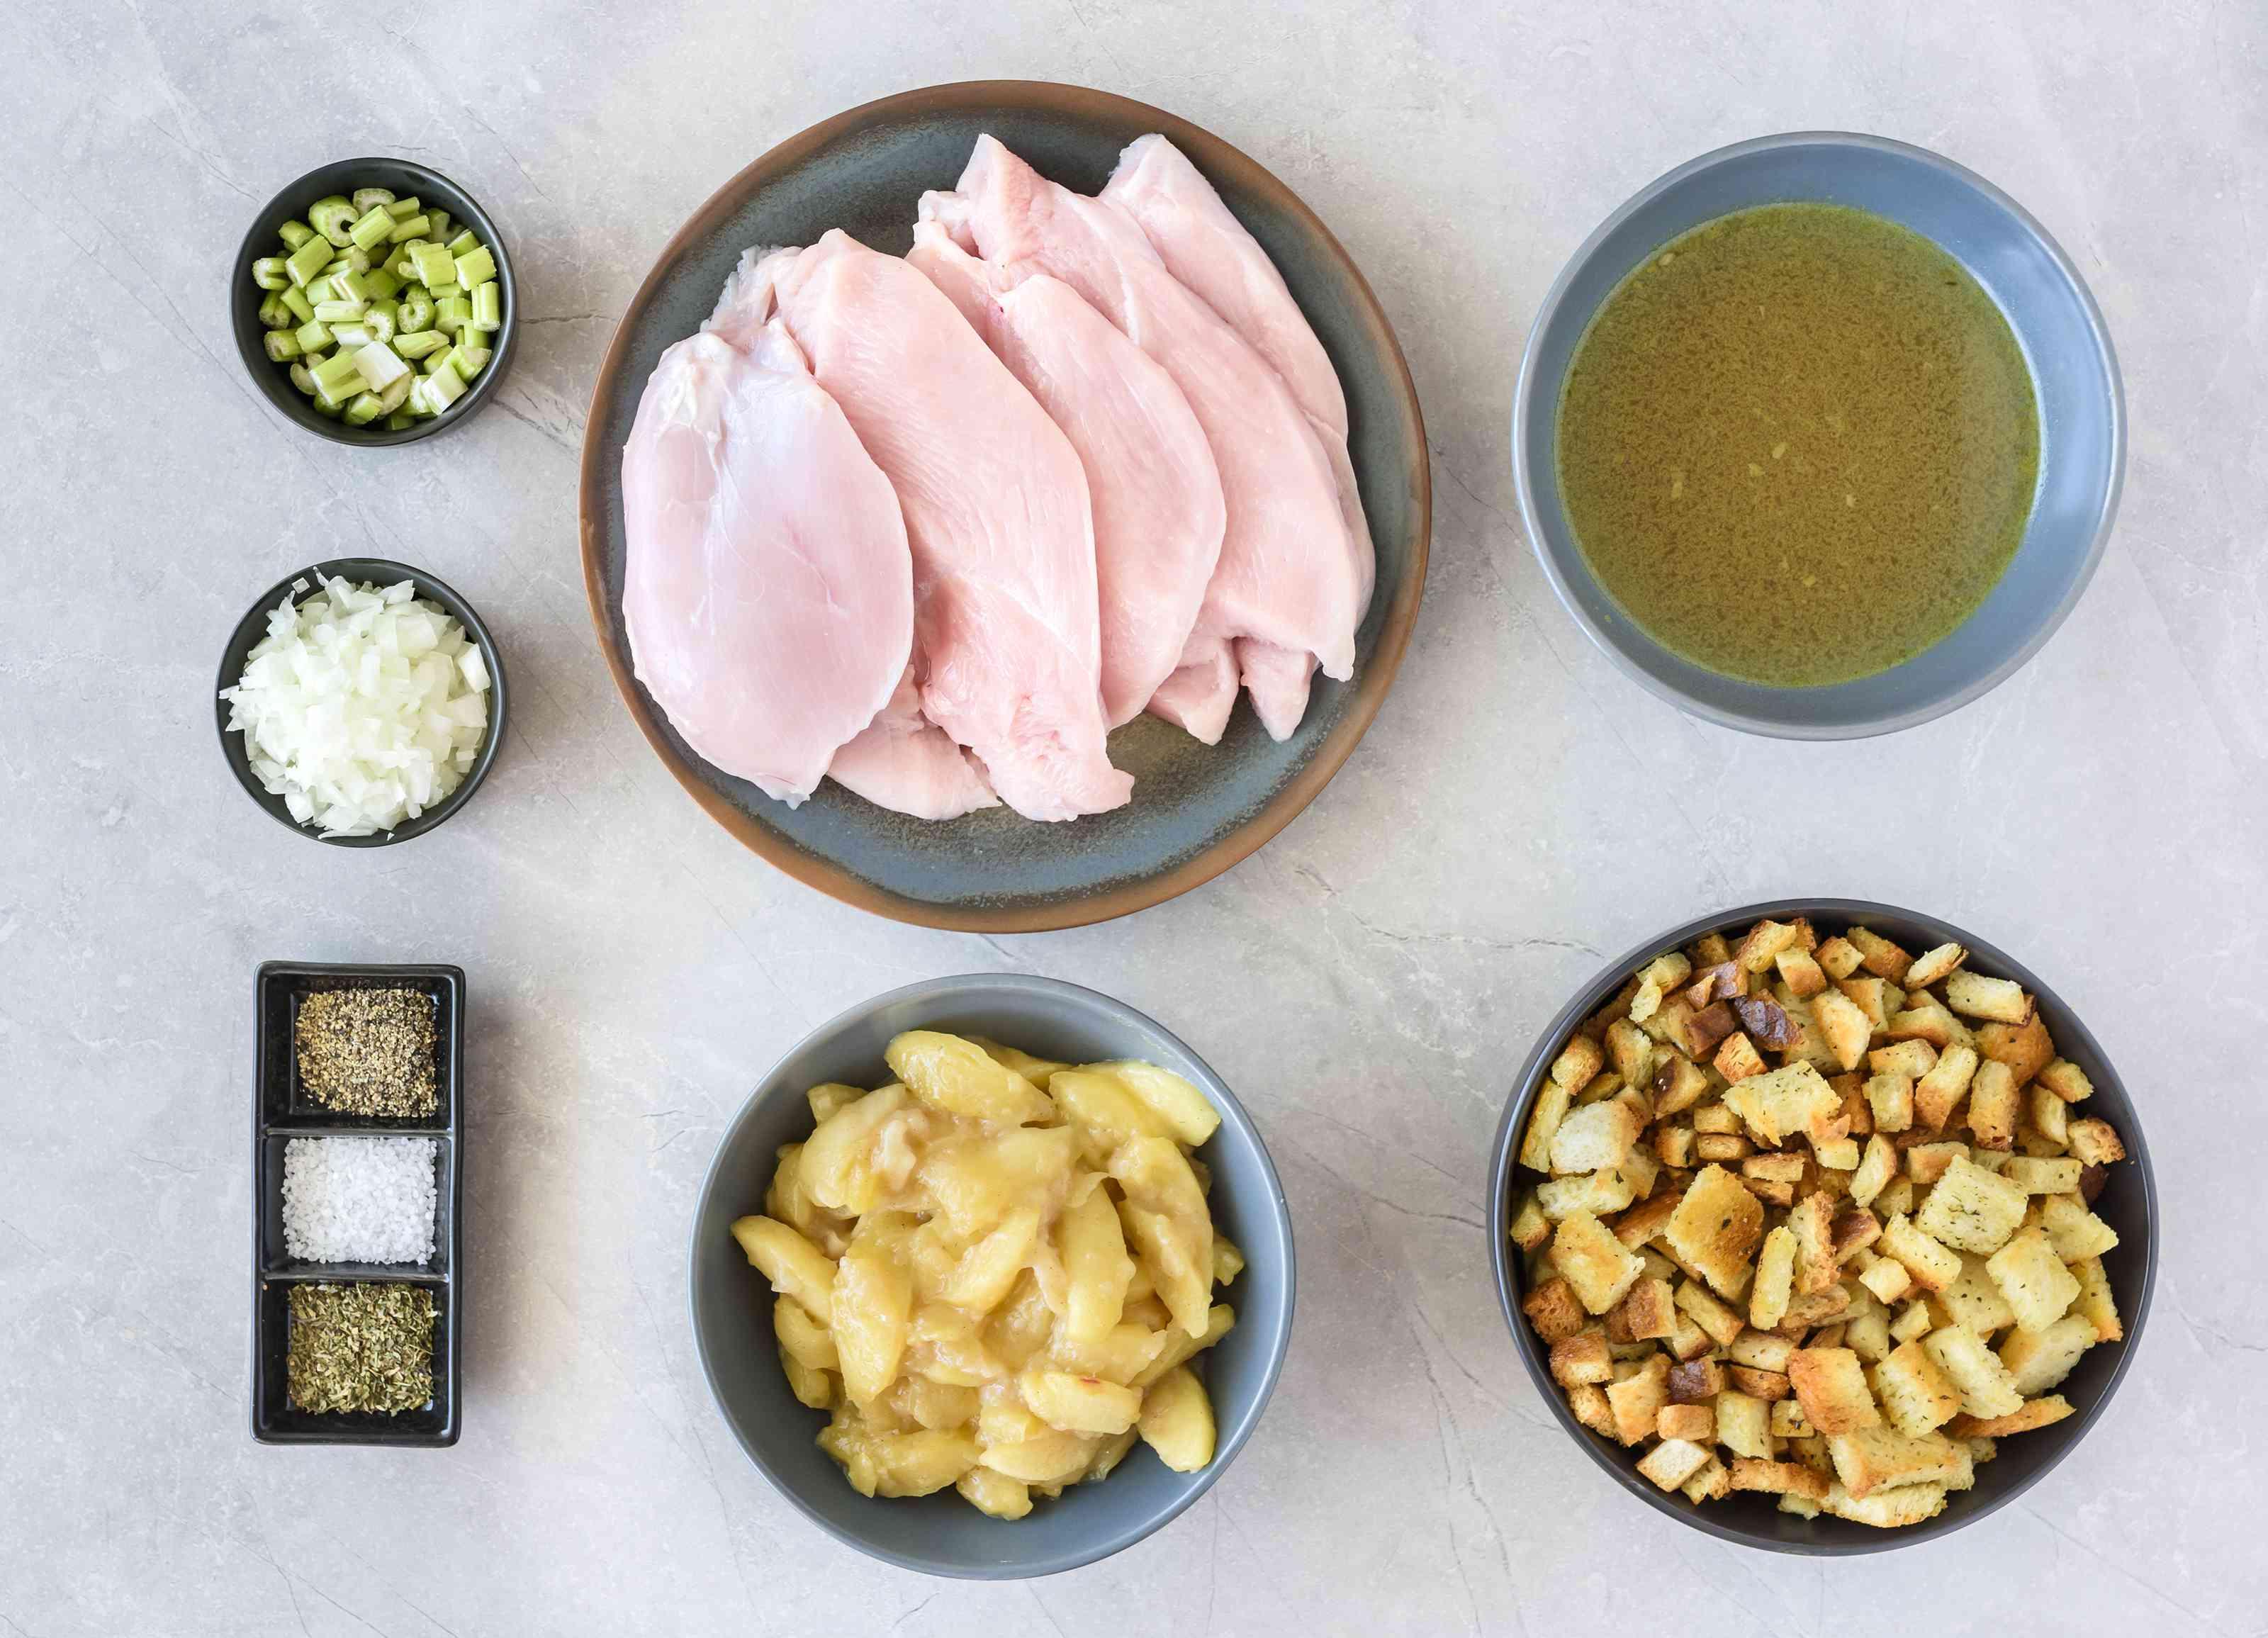 Ingredients for crockpot turkey cutlets recipe